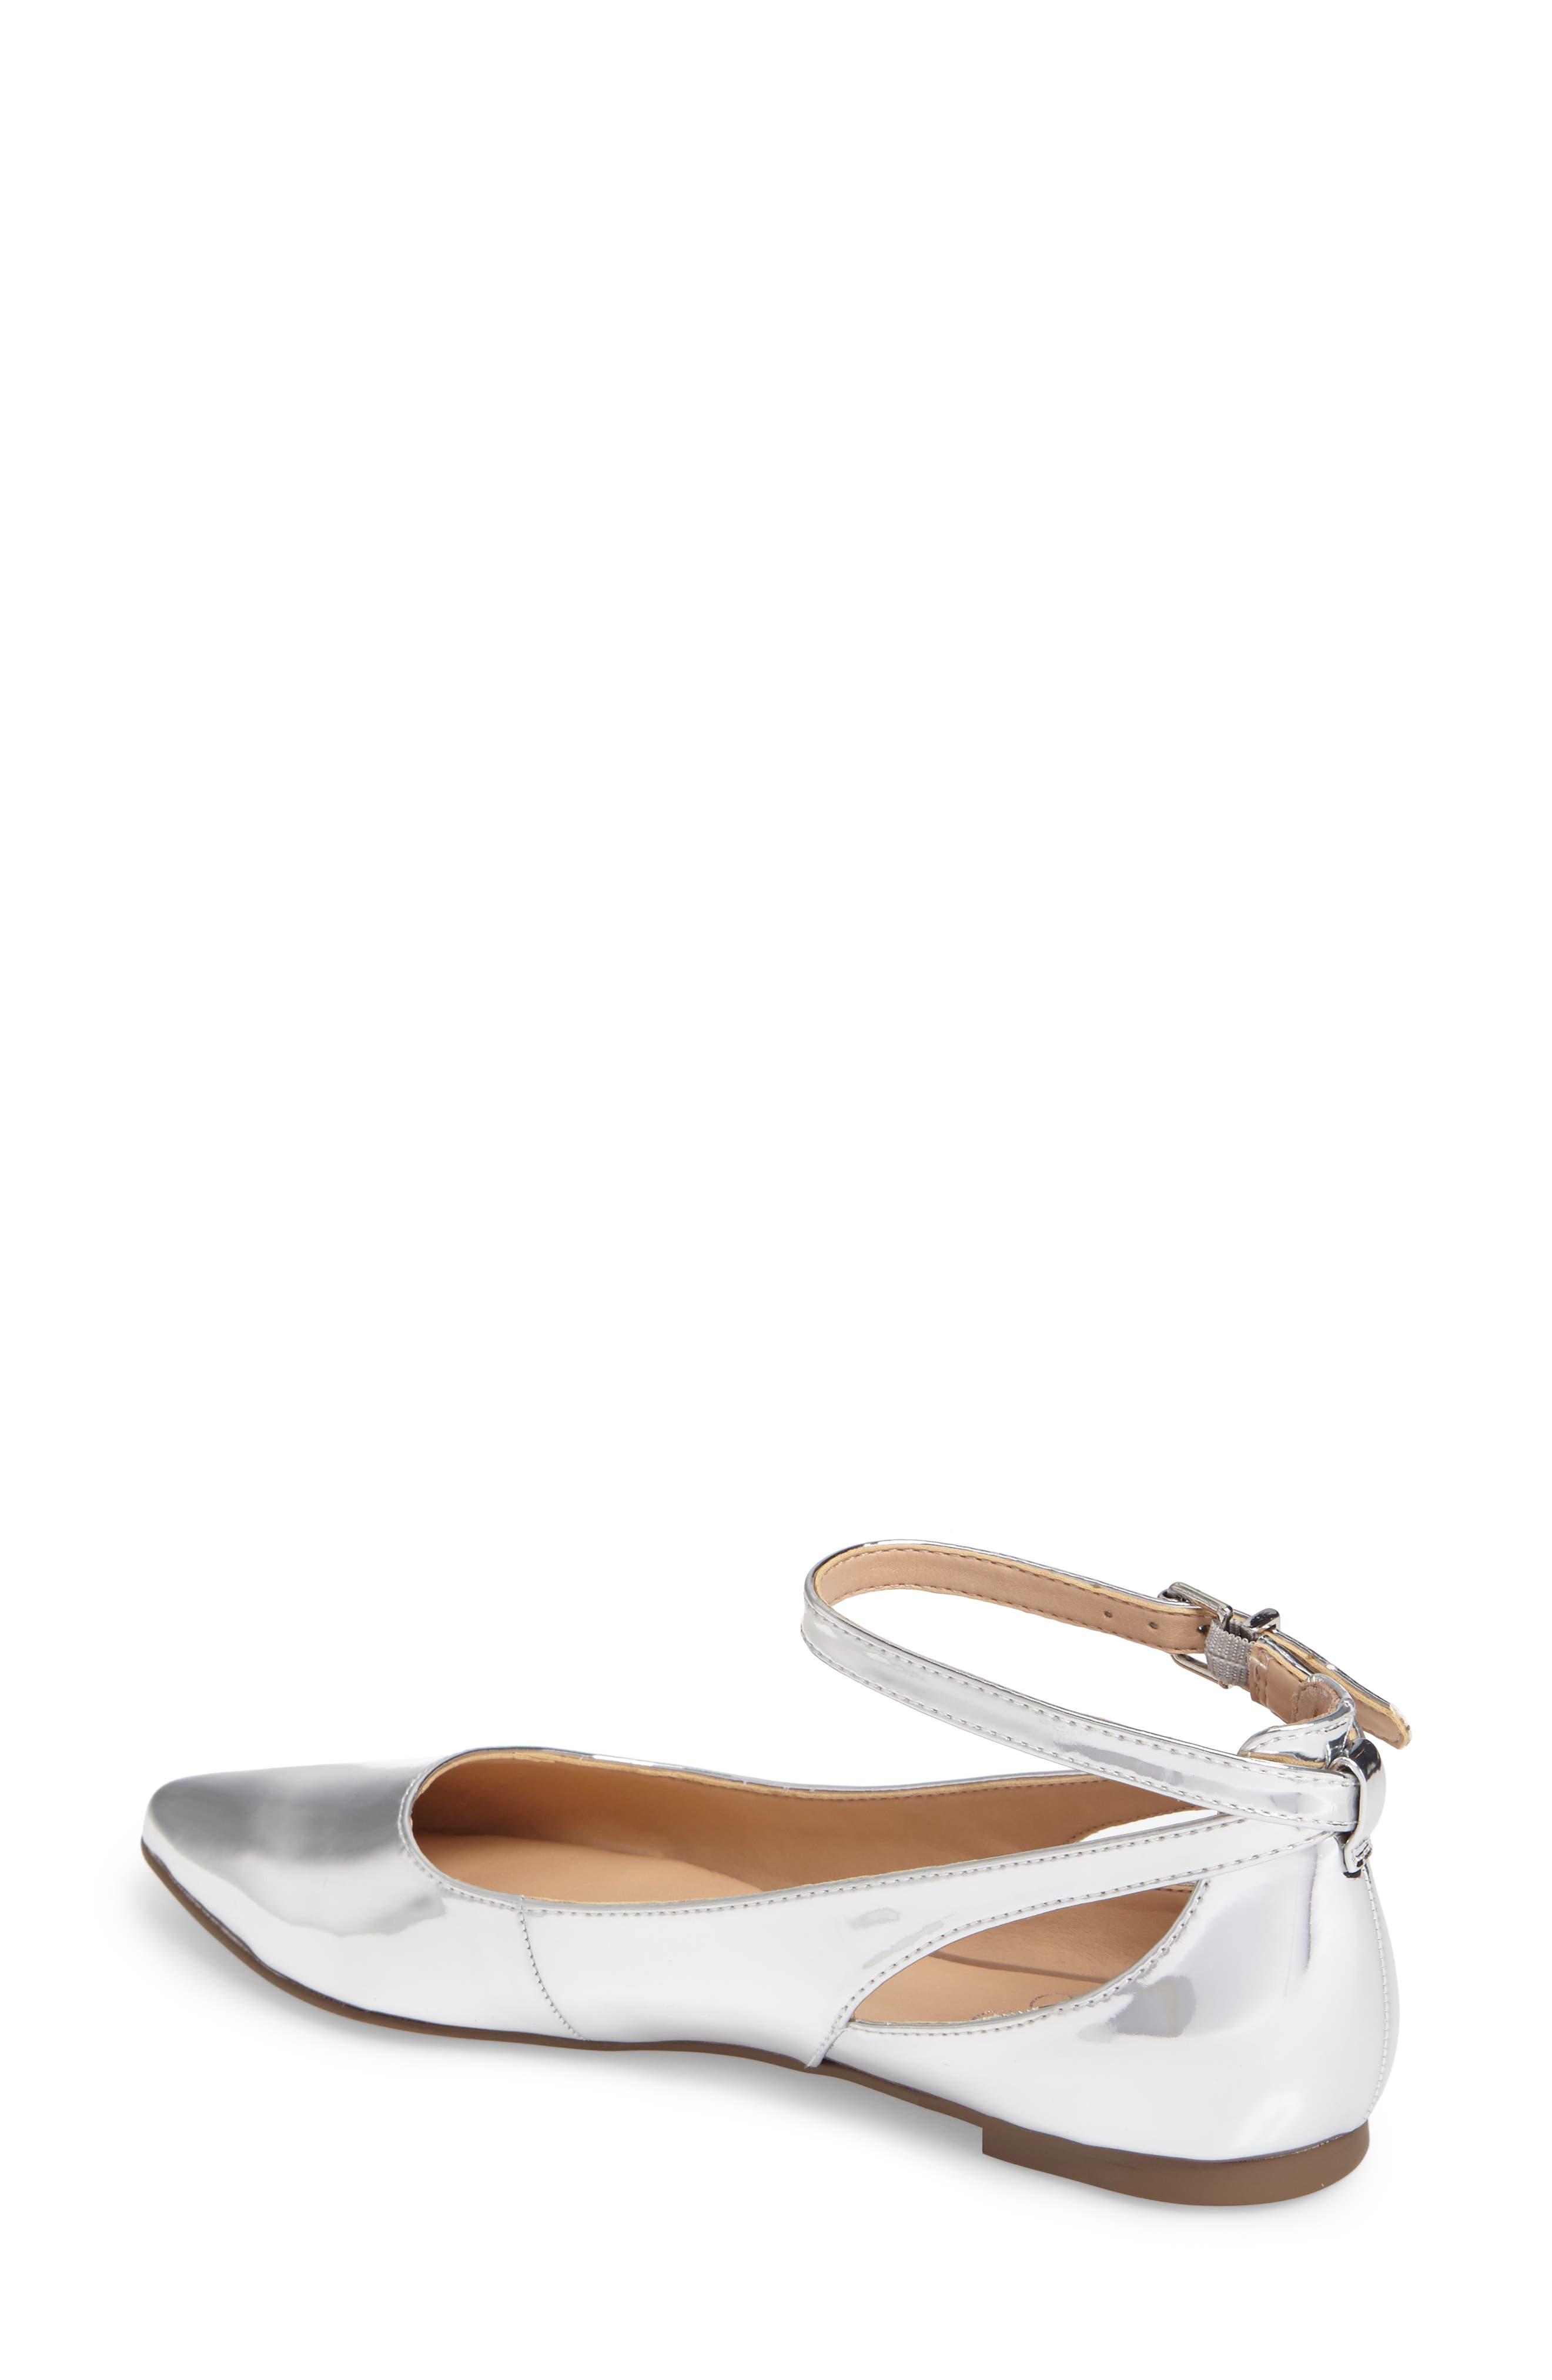 Sylvia Ankle Strap Flat,                             Alternate thumbnail 2, color,                             040